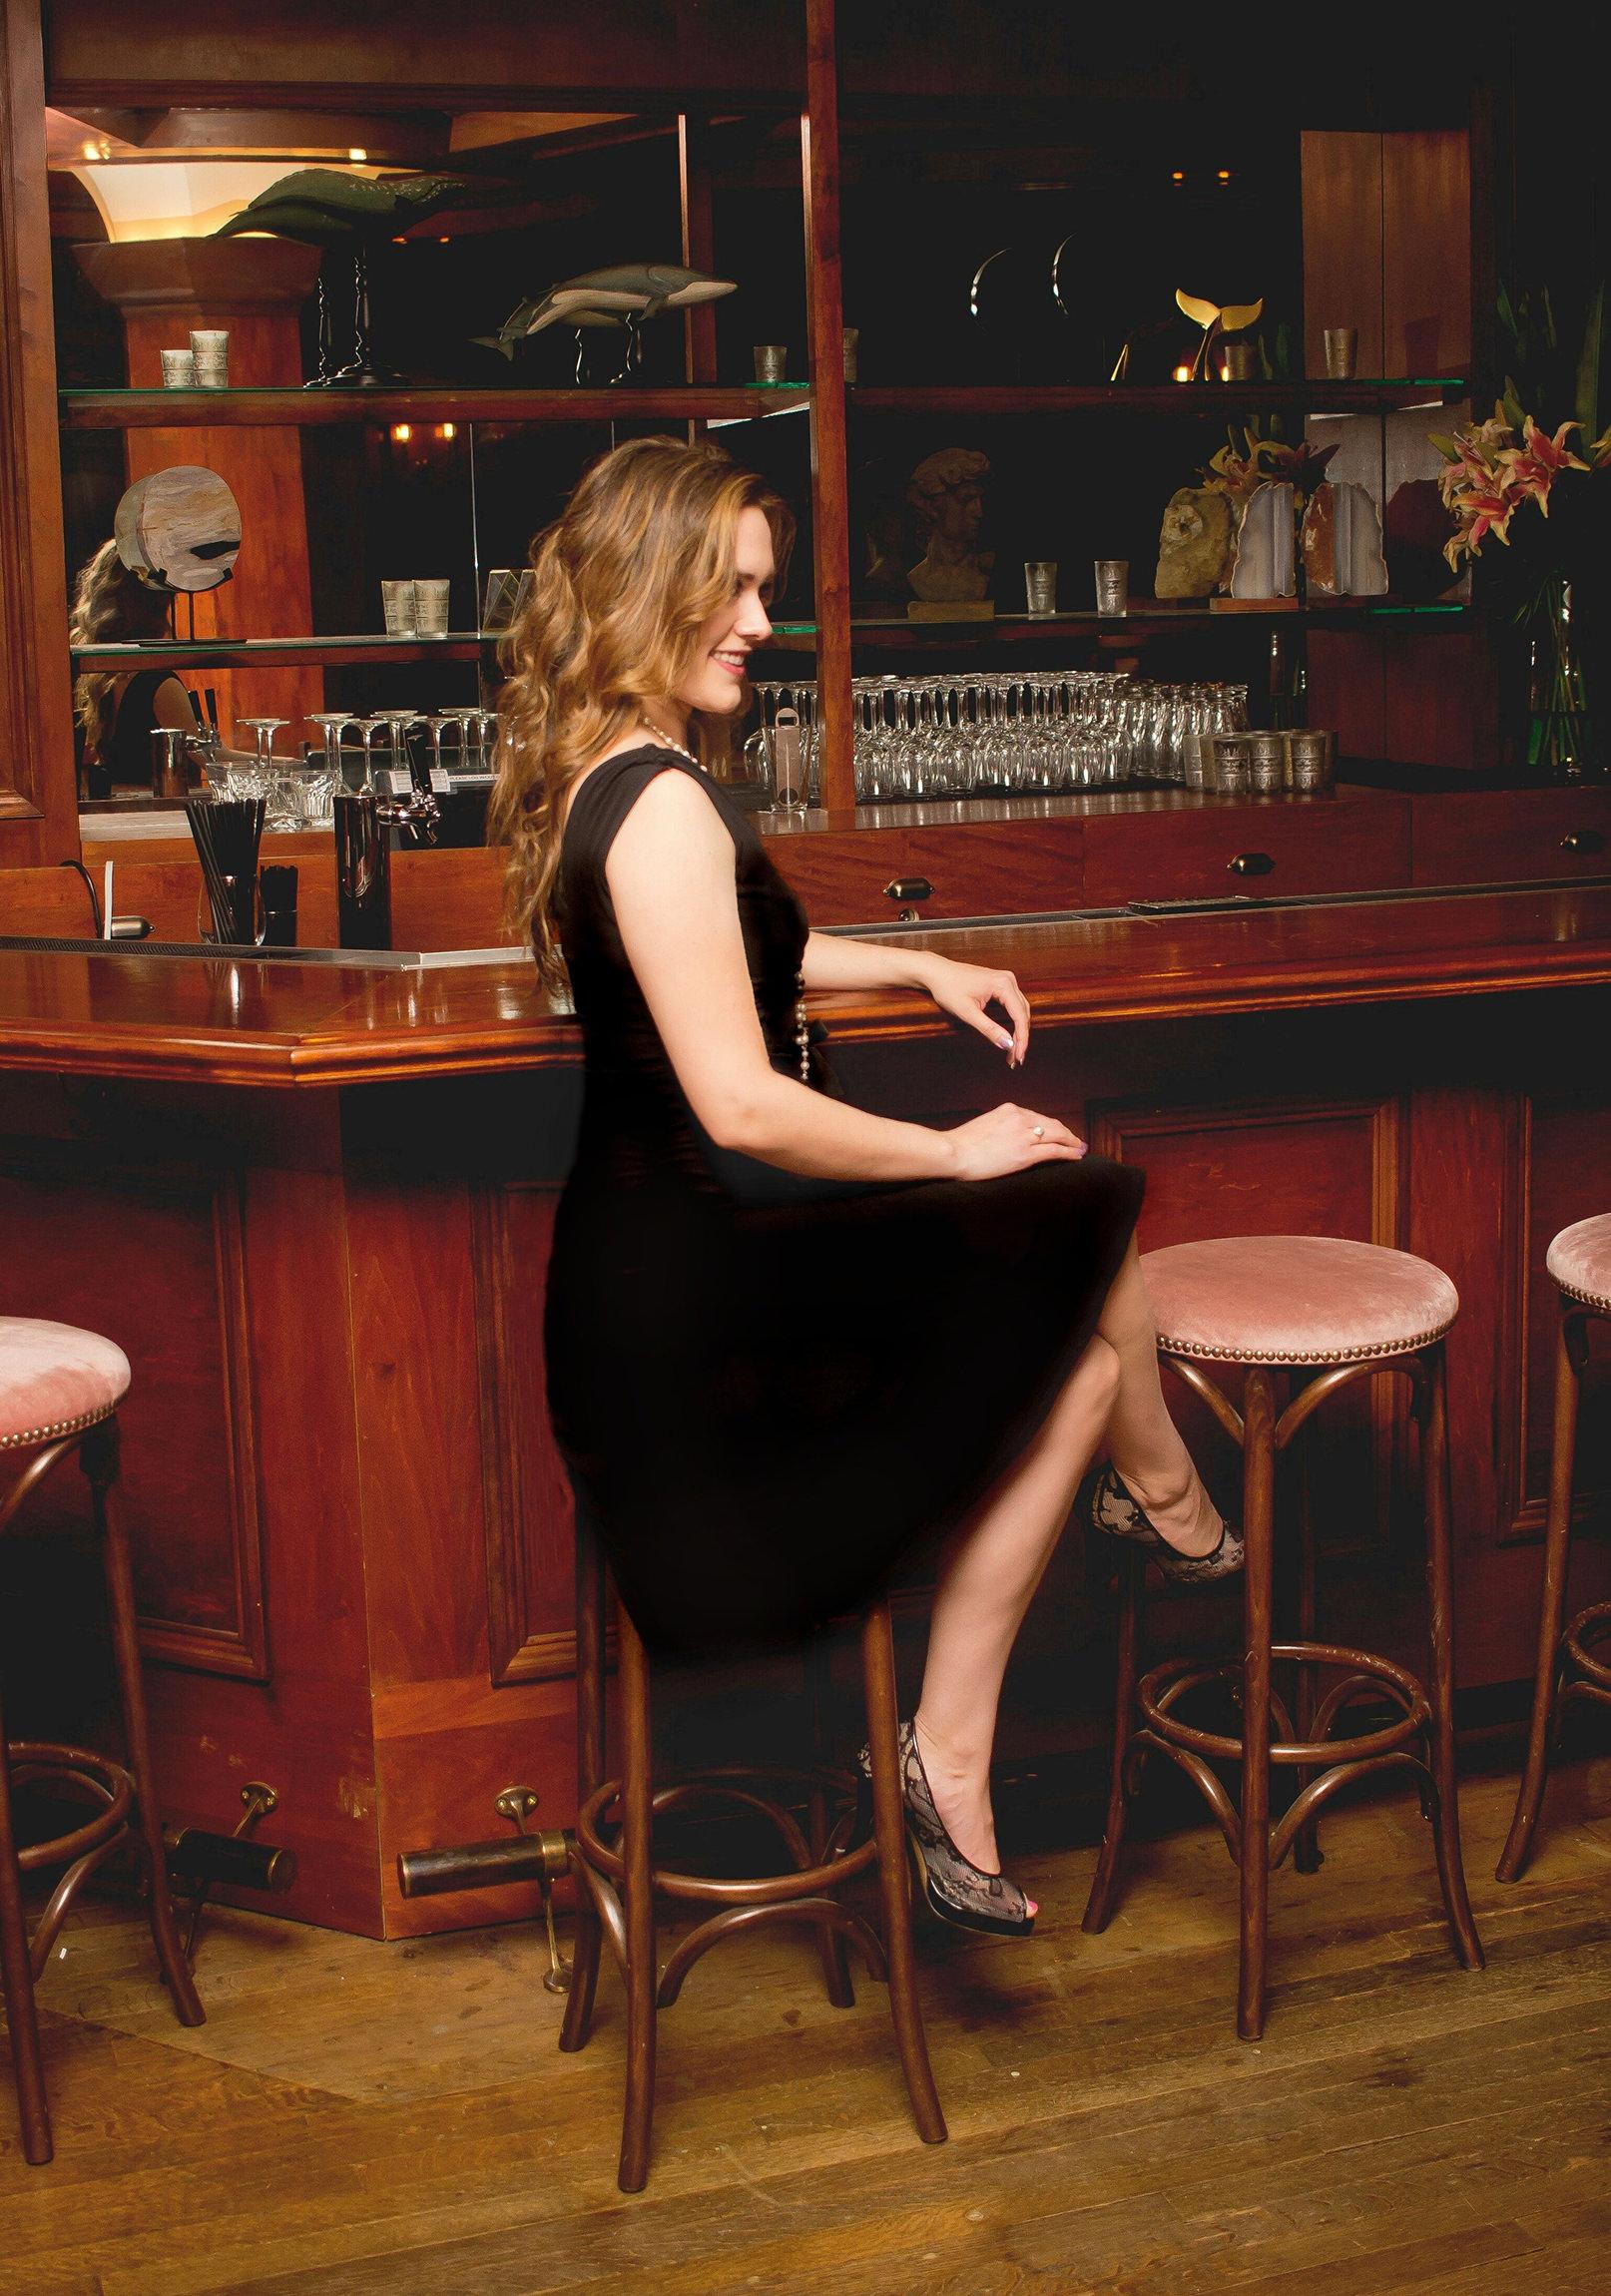 Seattle's Best - Sorrento Hotel - Katherine Chloe Cahoon G